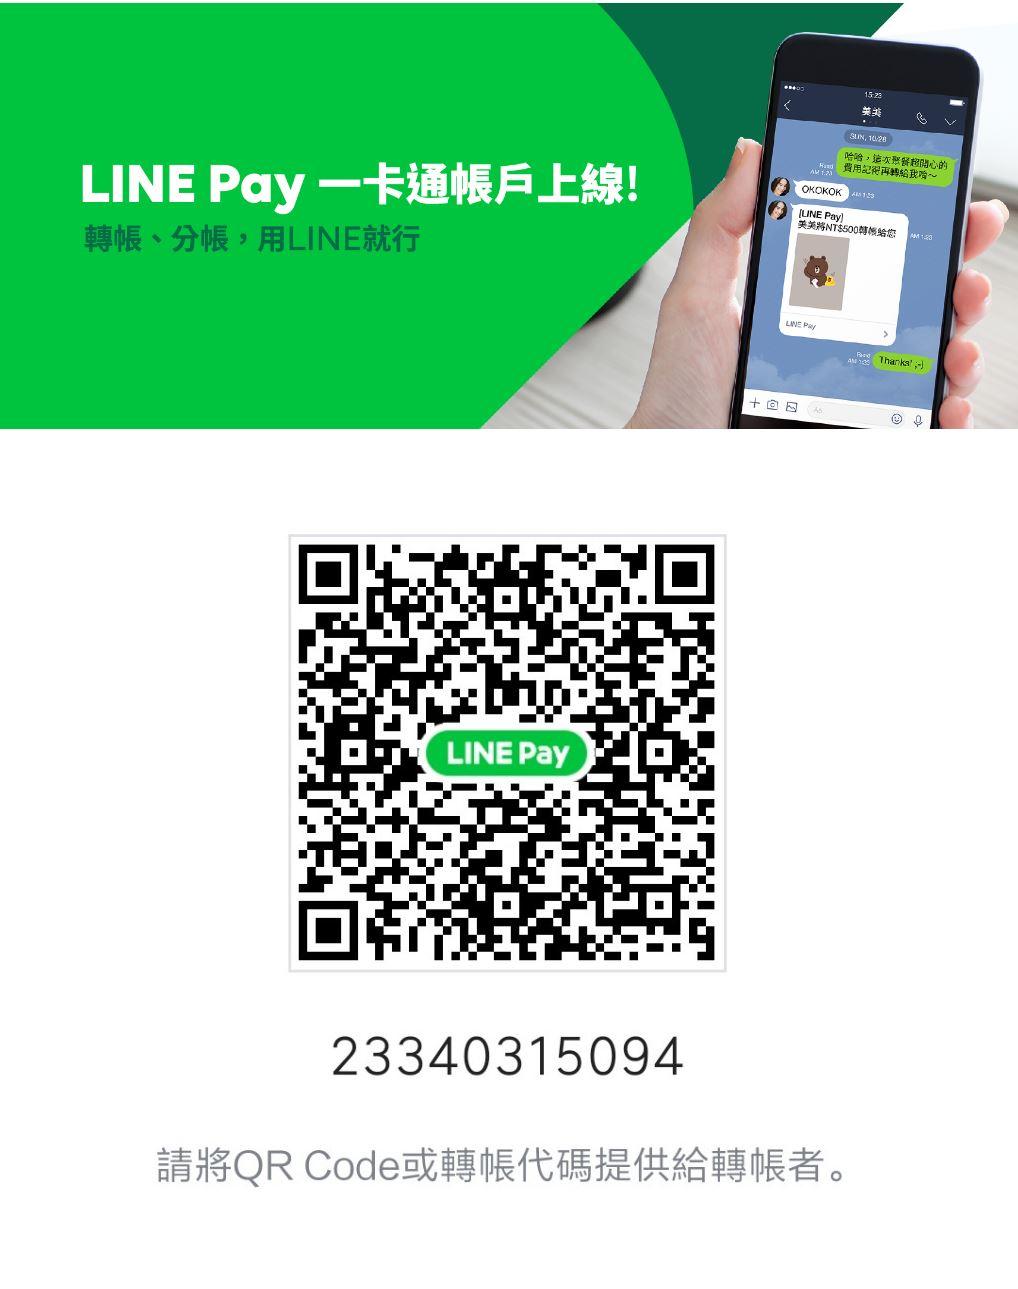 Line Pay 一卡通 QR Code